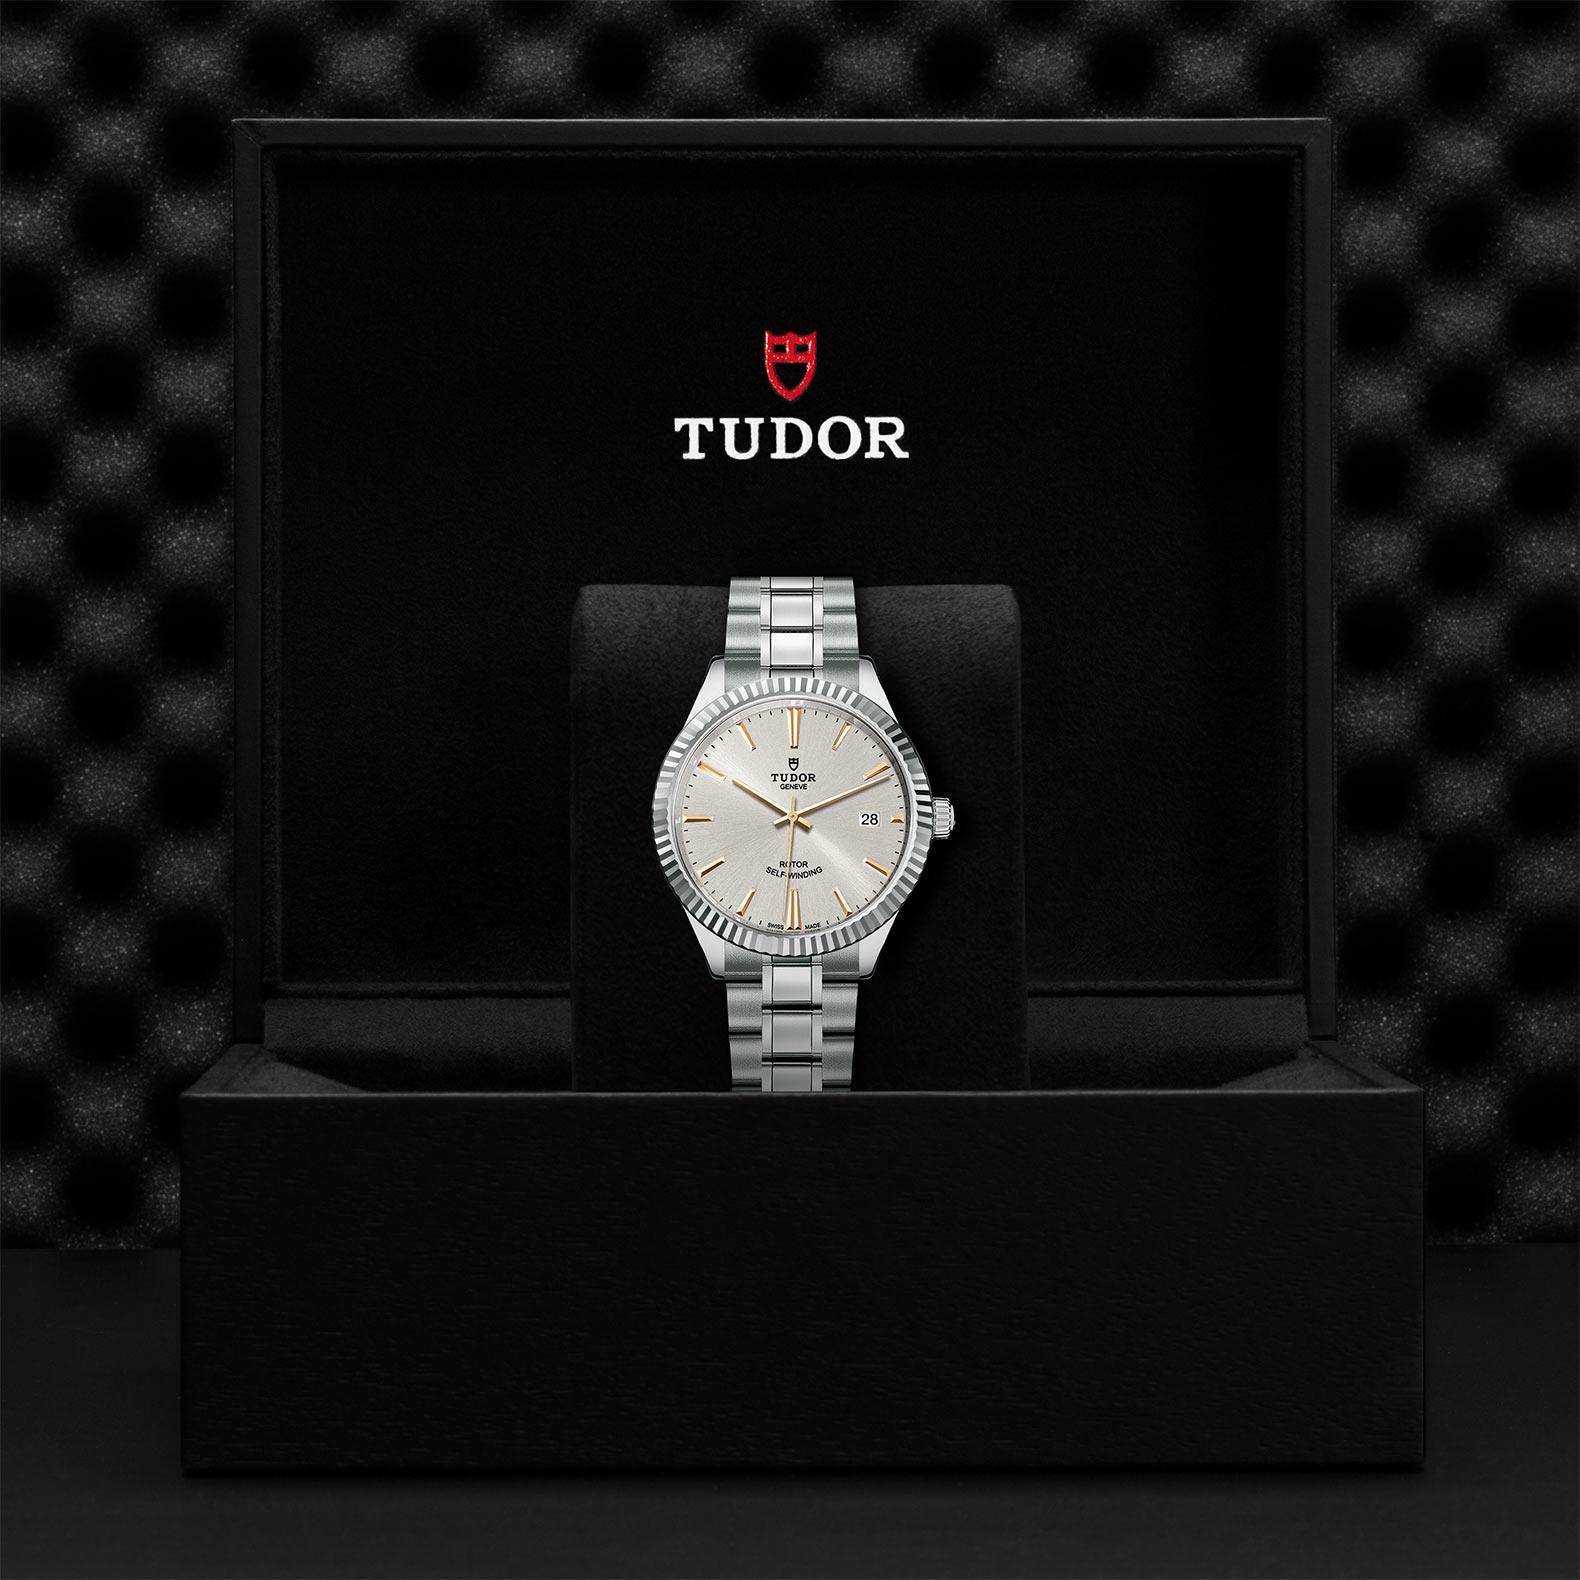 TUDOR Style M12510 0005 Presentationbox